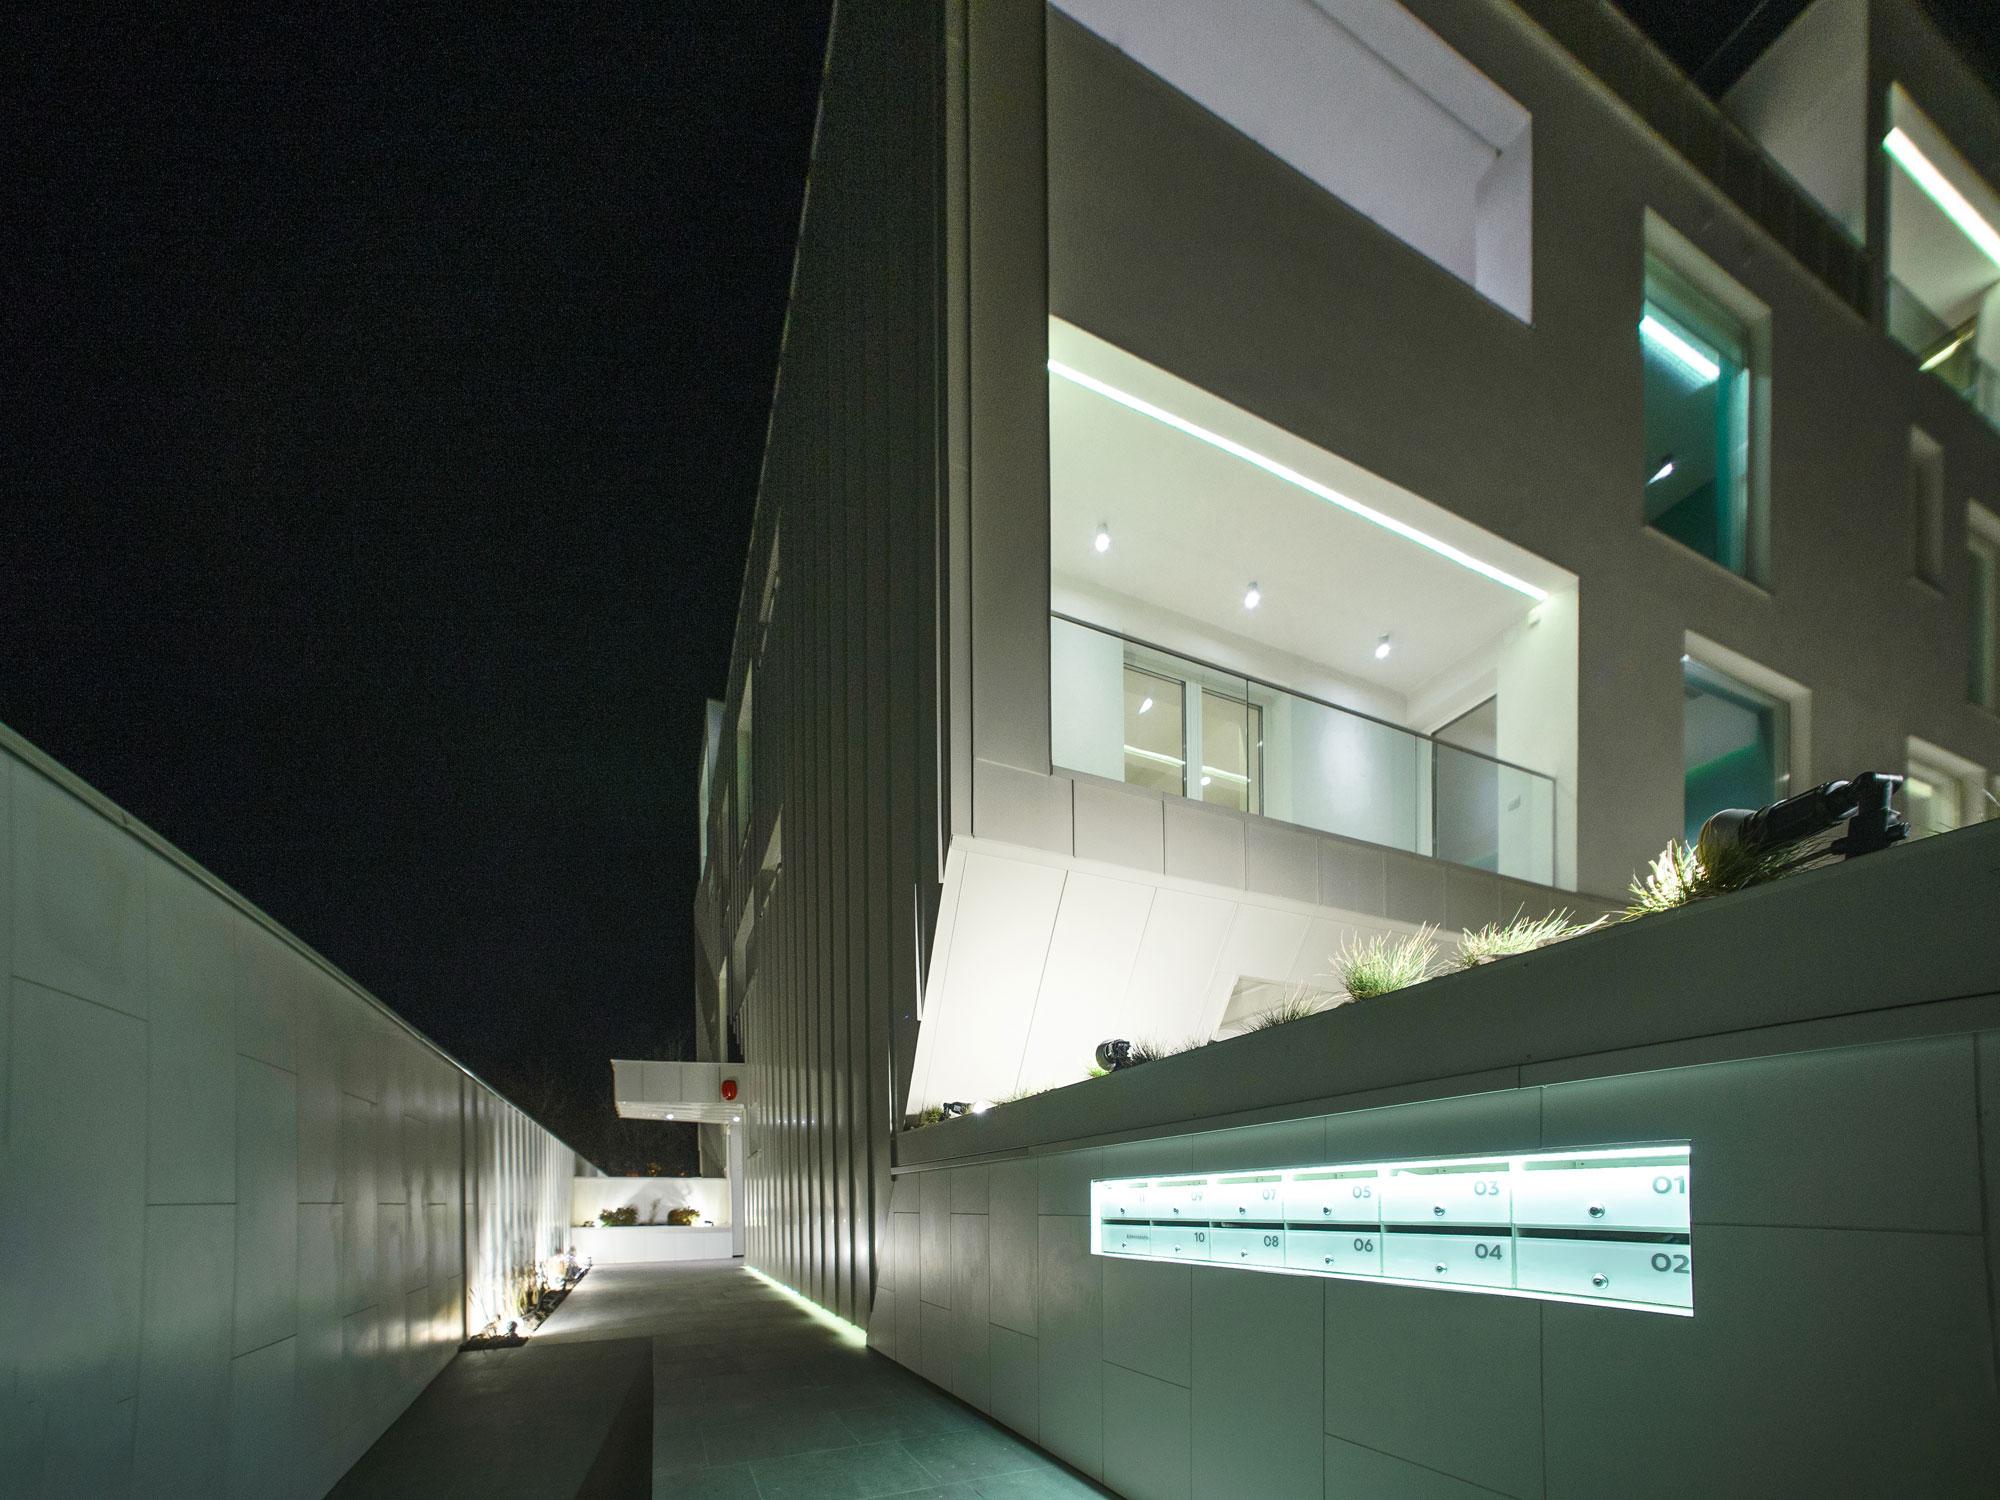 https://nbc-arhitect.ro/wp-content/uploads/2020/10/NBC-Arhitect-_-residential-_-Duplex-Forest-Residence-_-Romania_49.jpg